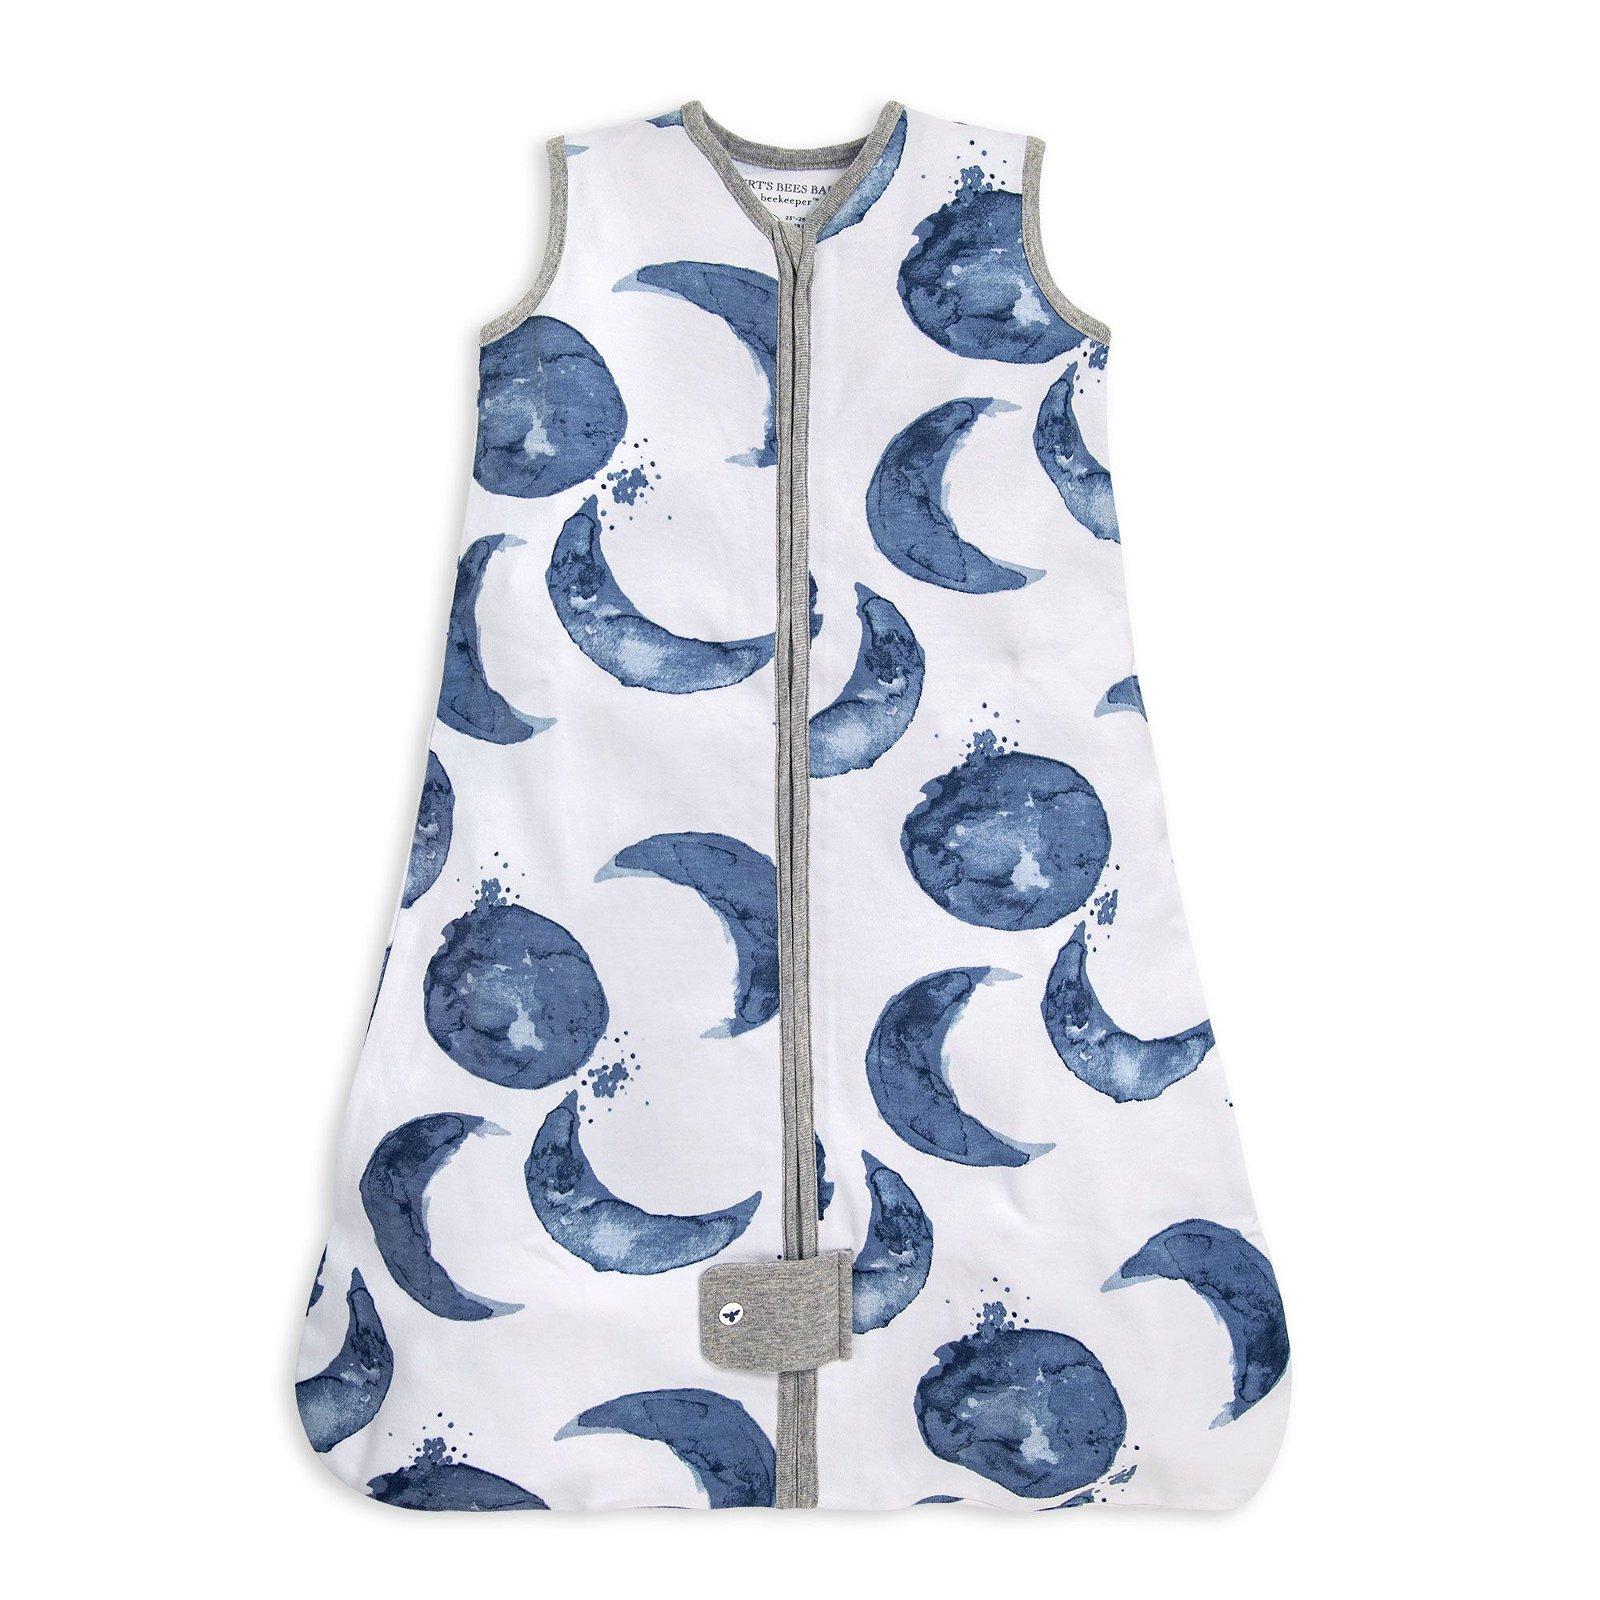 Beekeeper™ Hello Moon! Organic Baby Wearable Blanket